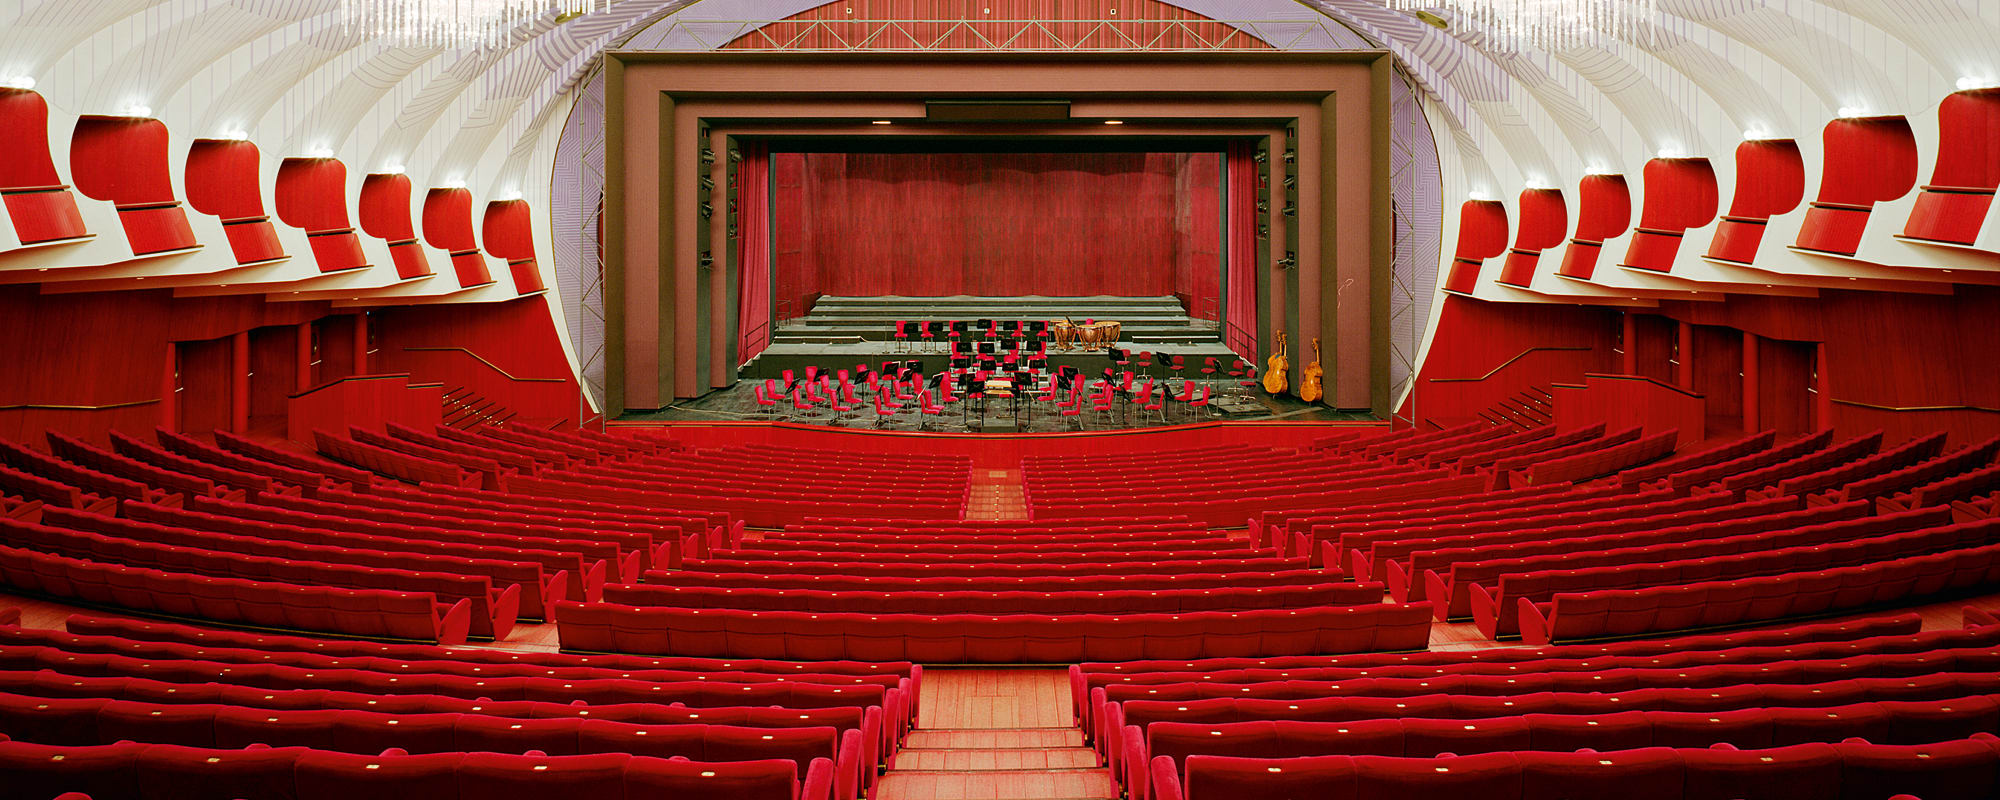 Teatro Regio, Carlo Mollino, Turin, Samt, Konzertsaal